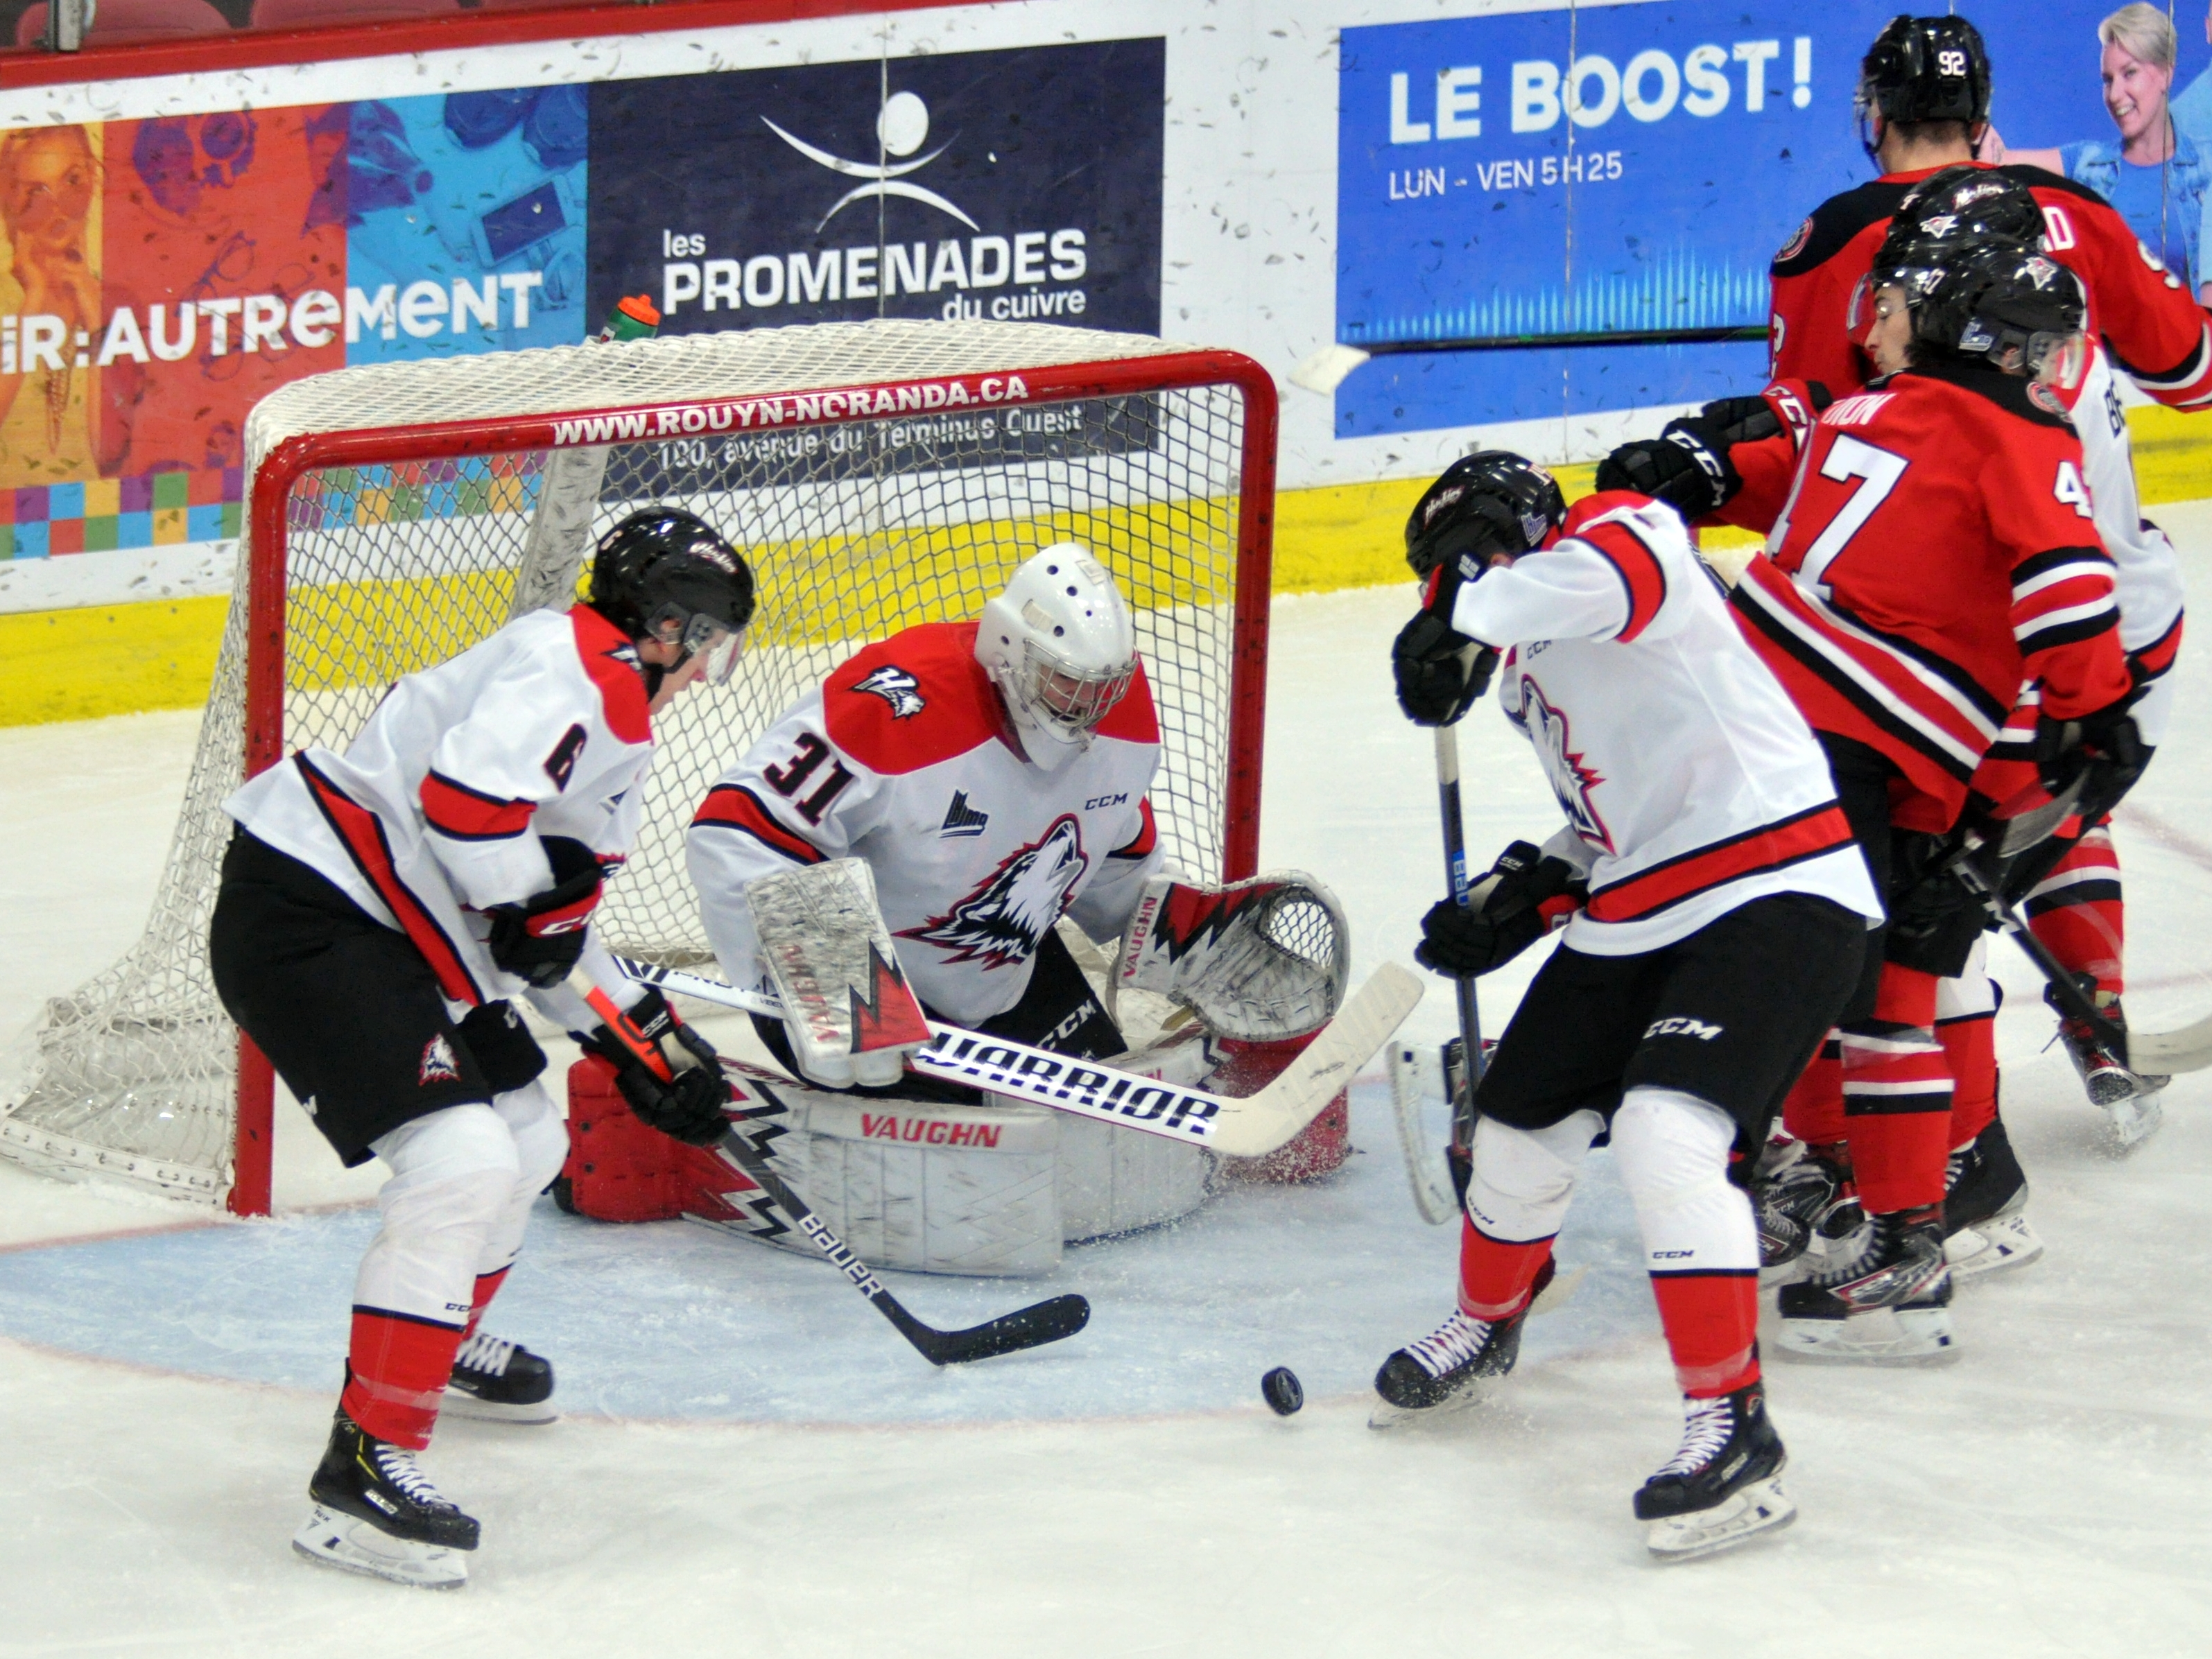 Huskies Rouyn-Noranda Voltigeurs Drummondville